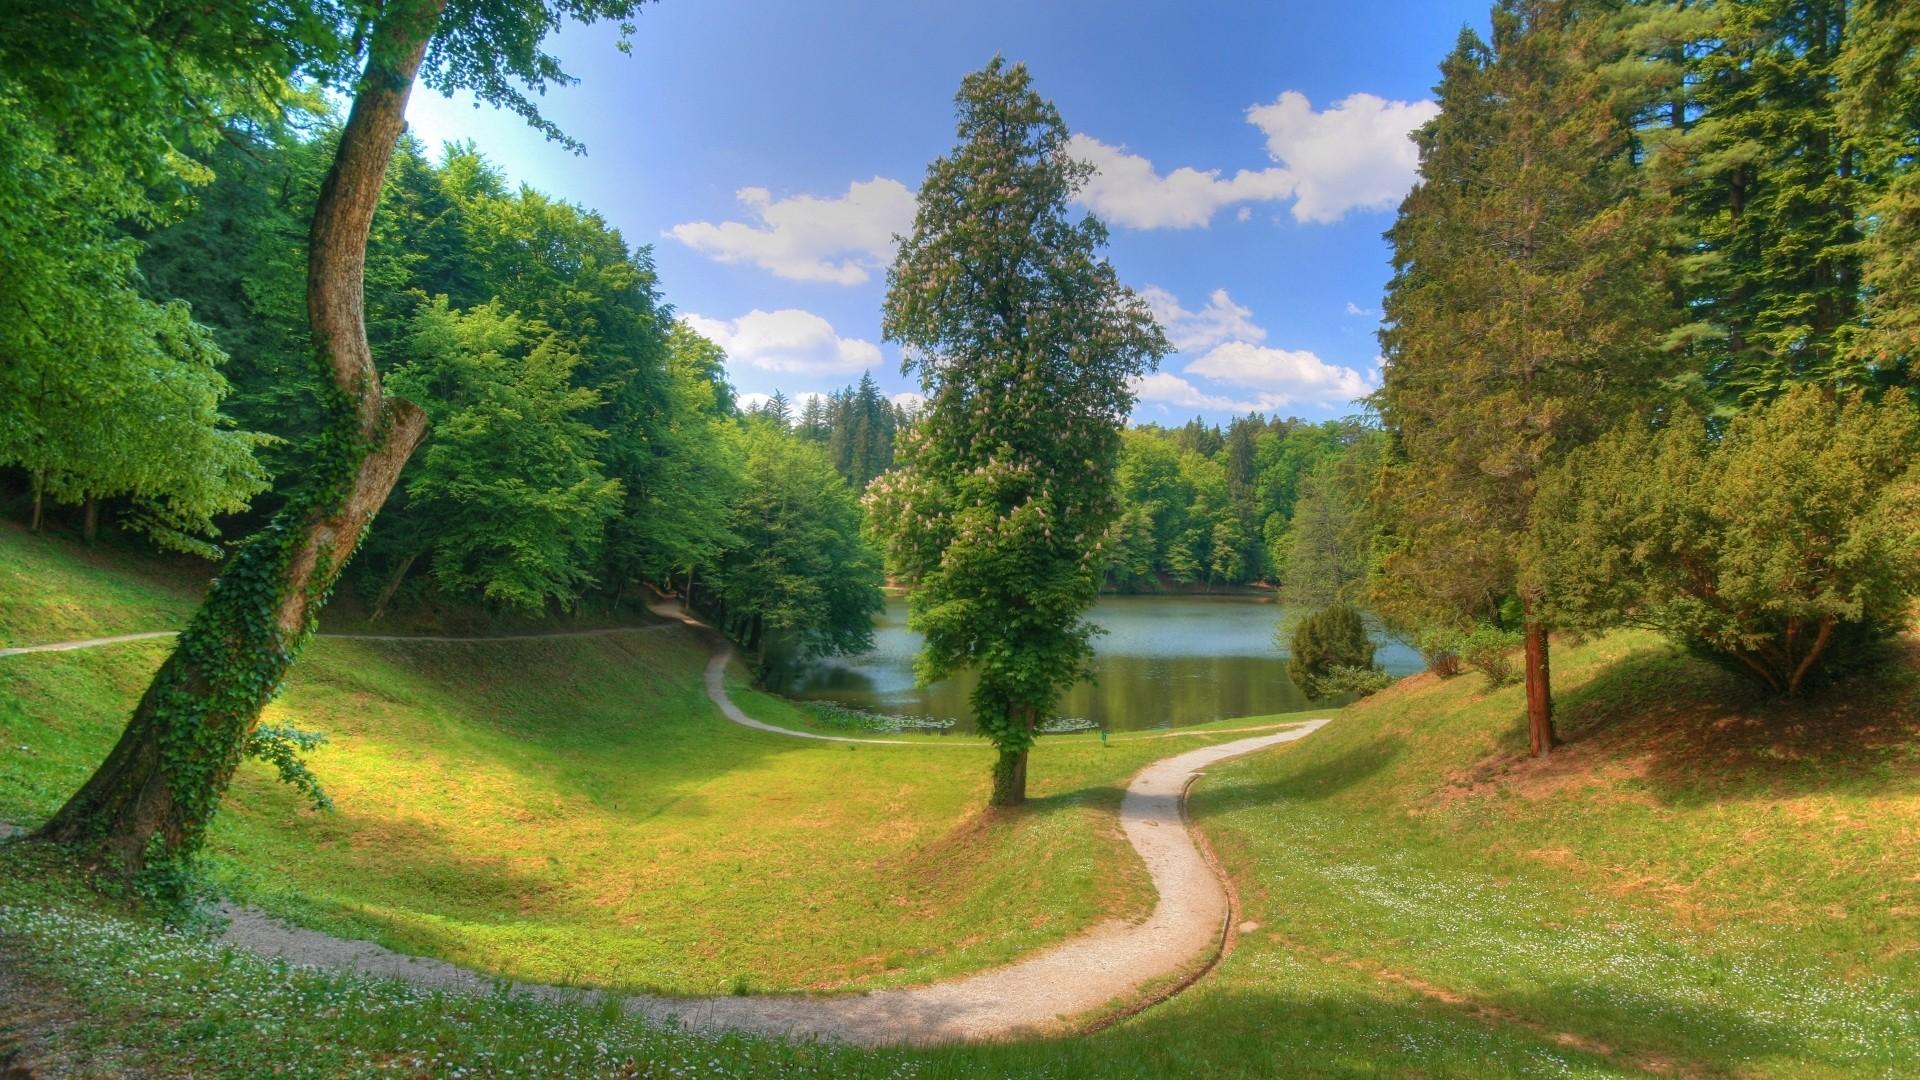 Download Full Green Relaxing Nature Wallpaper HD #2861 – HD .